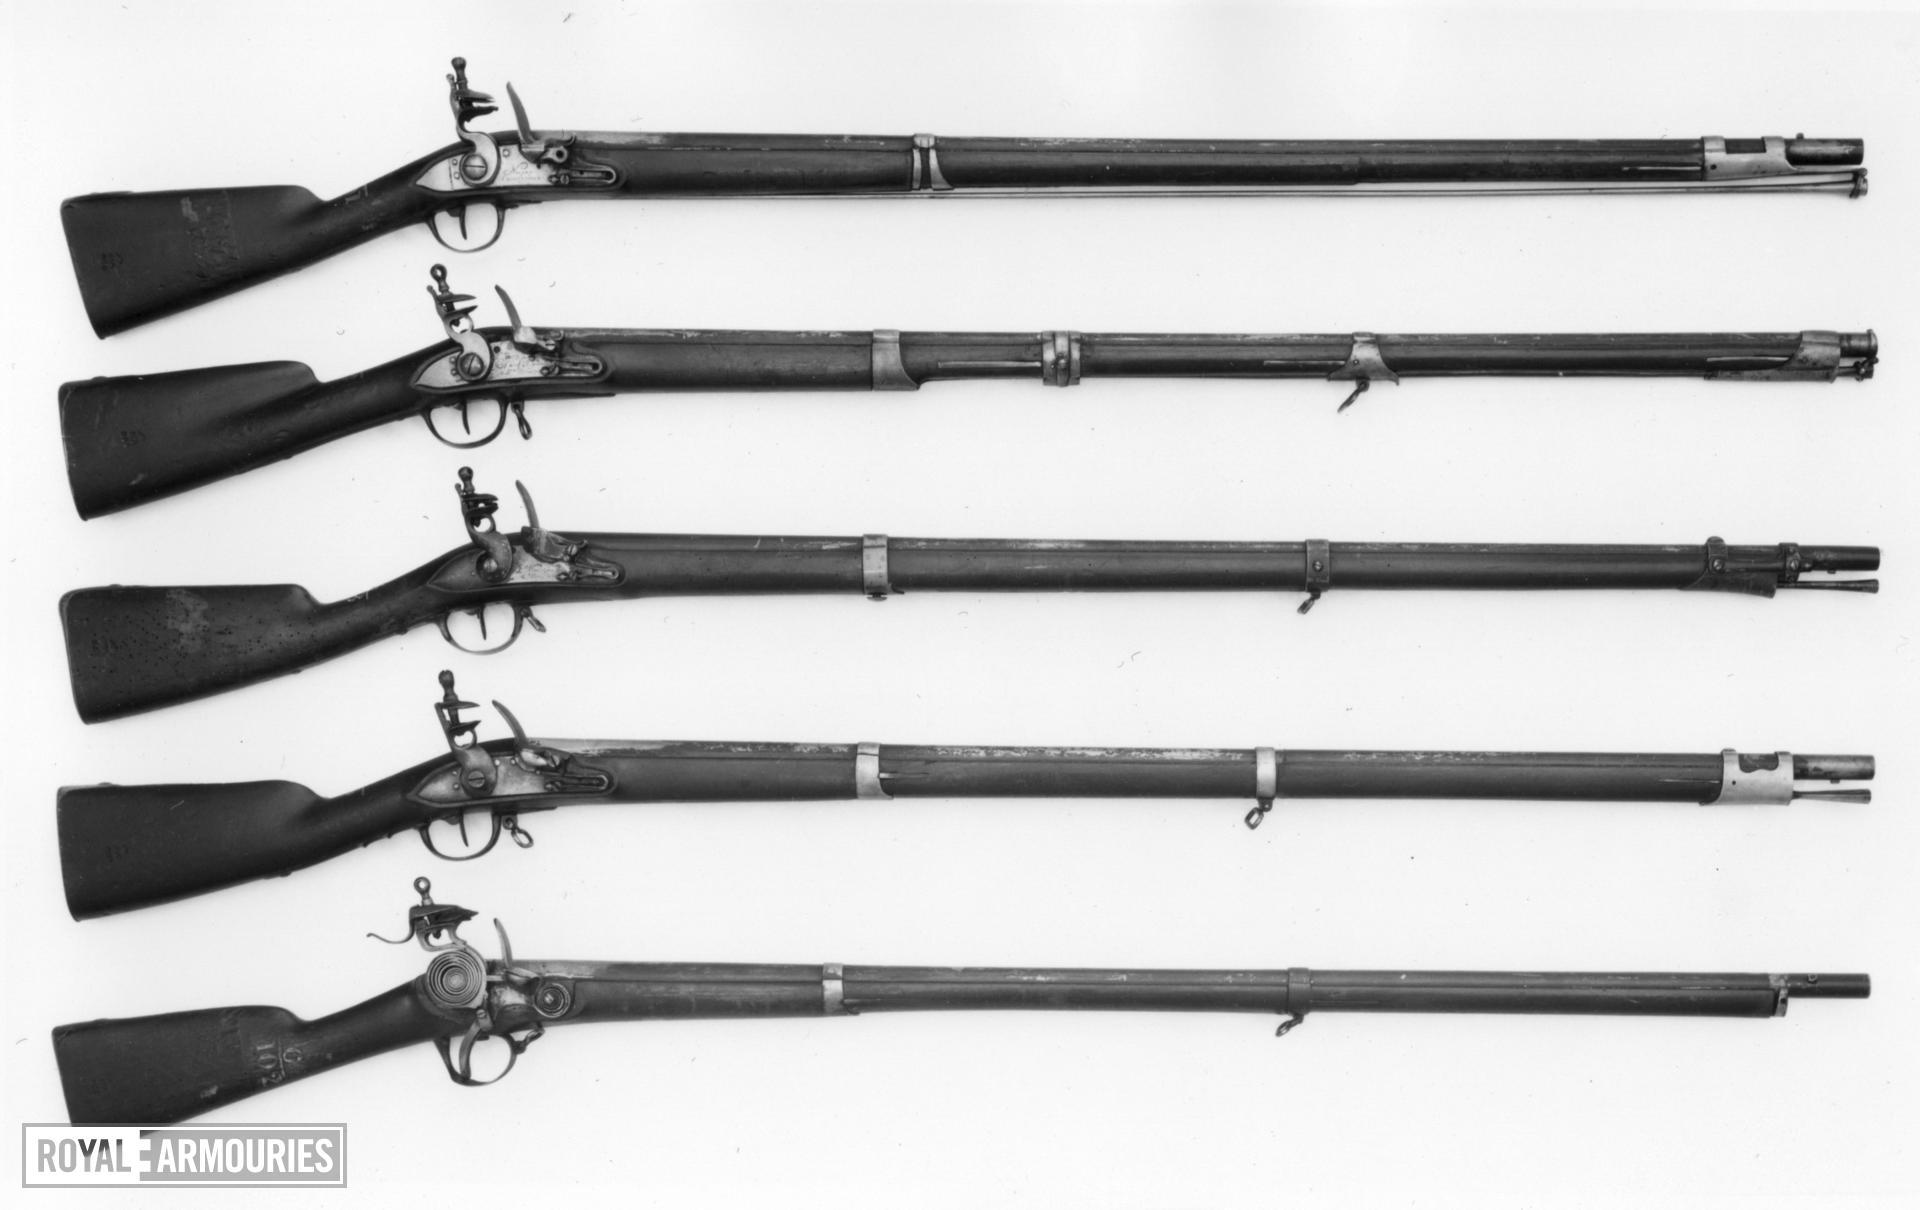 Flintlock muzzle-loading military musket - Laine Pattern